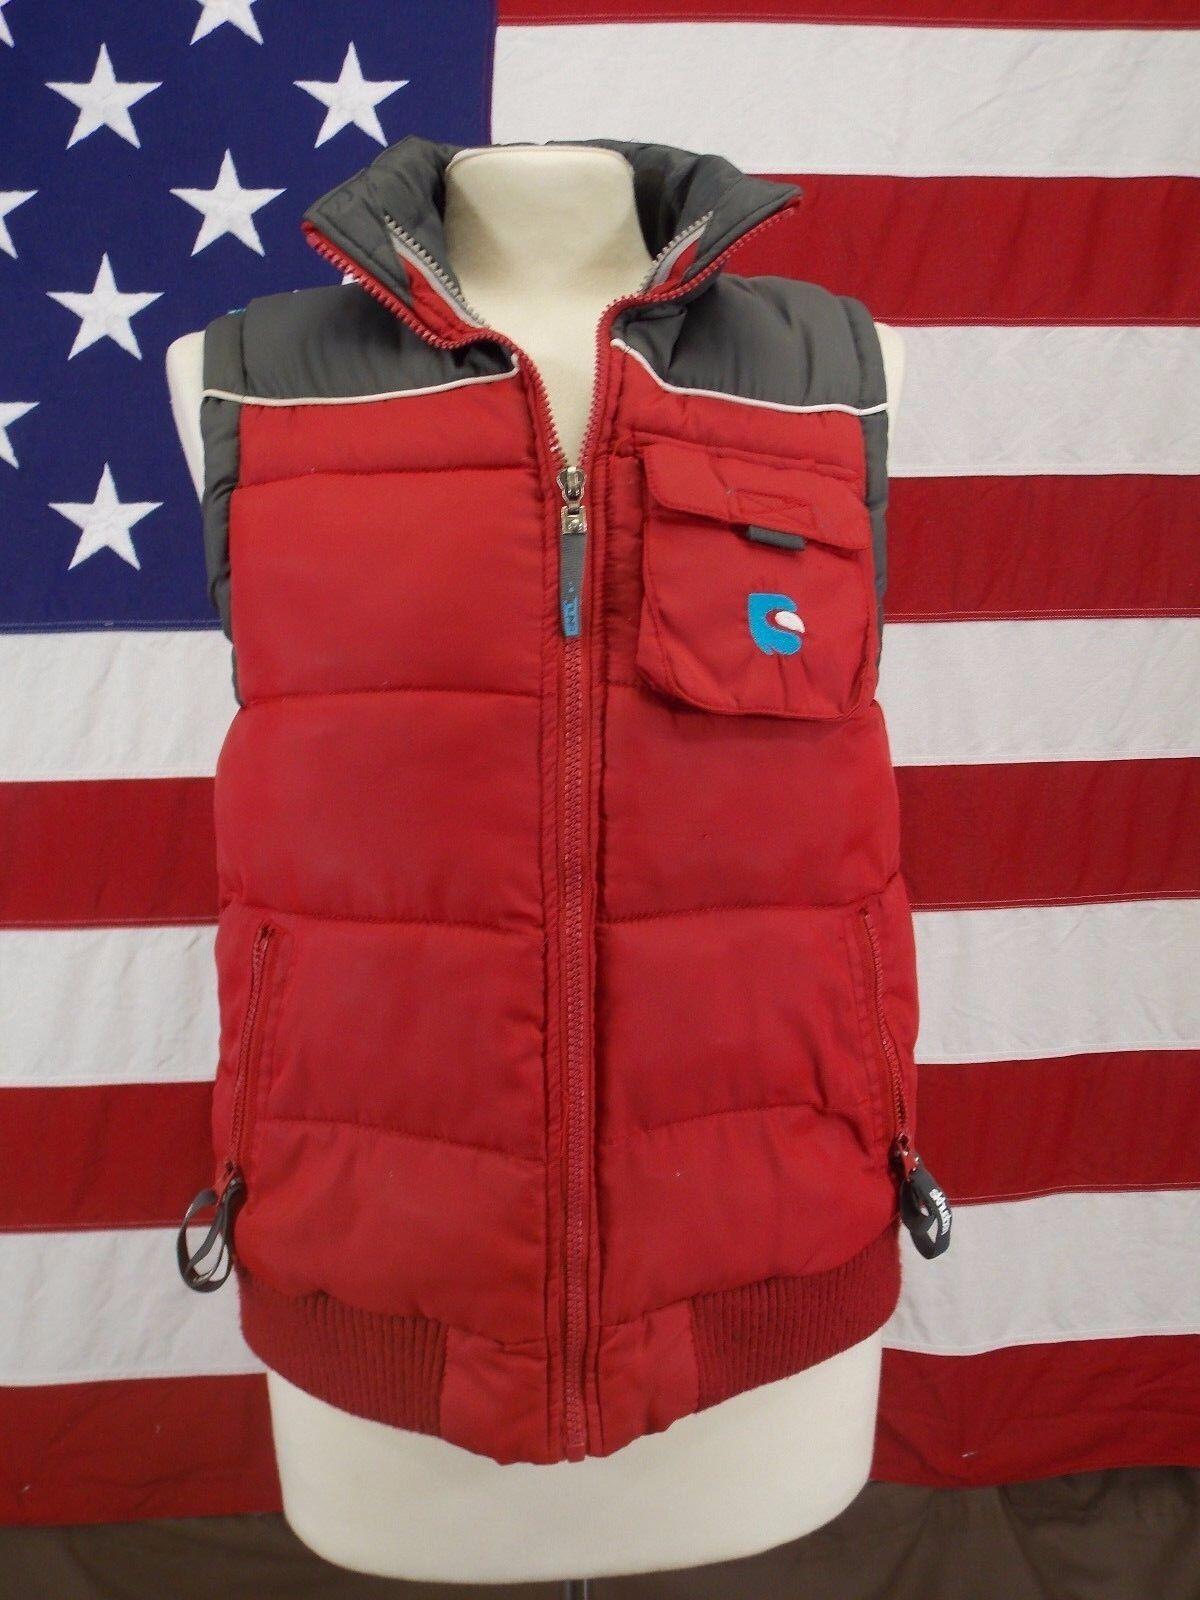 Skhuaban Weste Puffer Sleeveless Jacket Oberbekleidung Winter Kids Größe 10-12